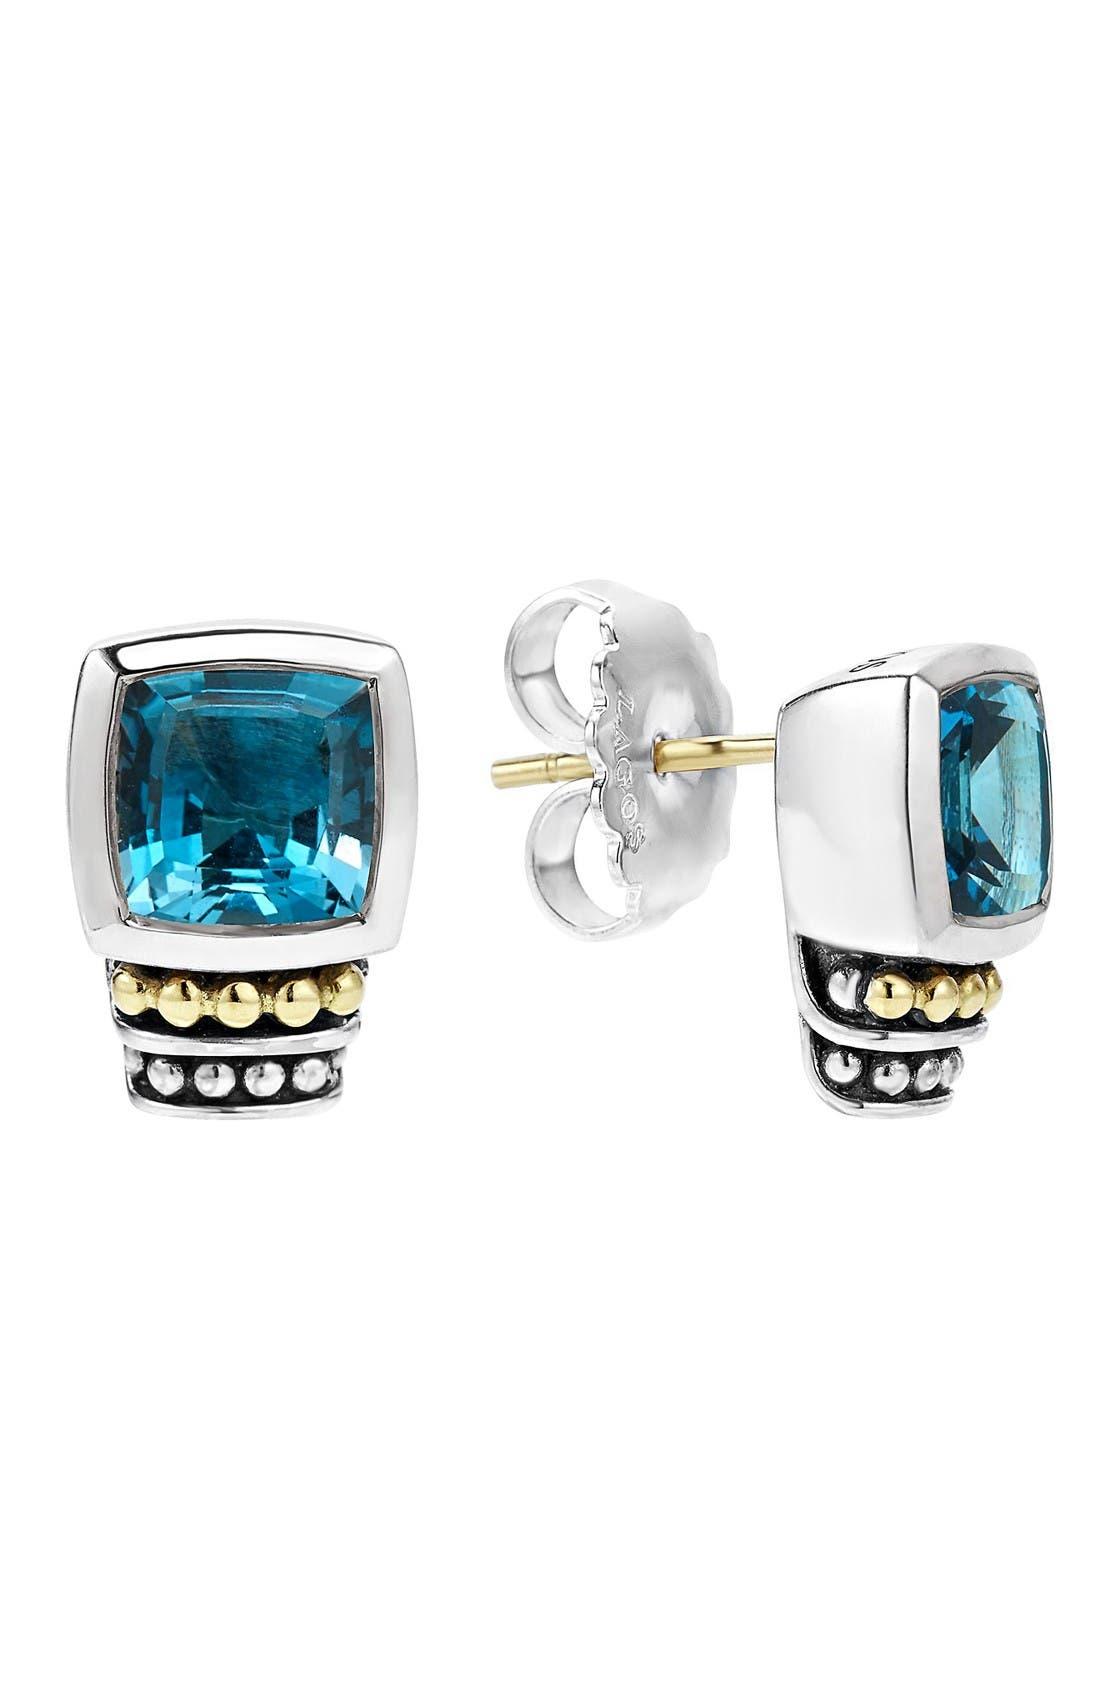 LAGOS Caviar Color Semiprecious Stone Stud Earrings